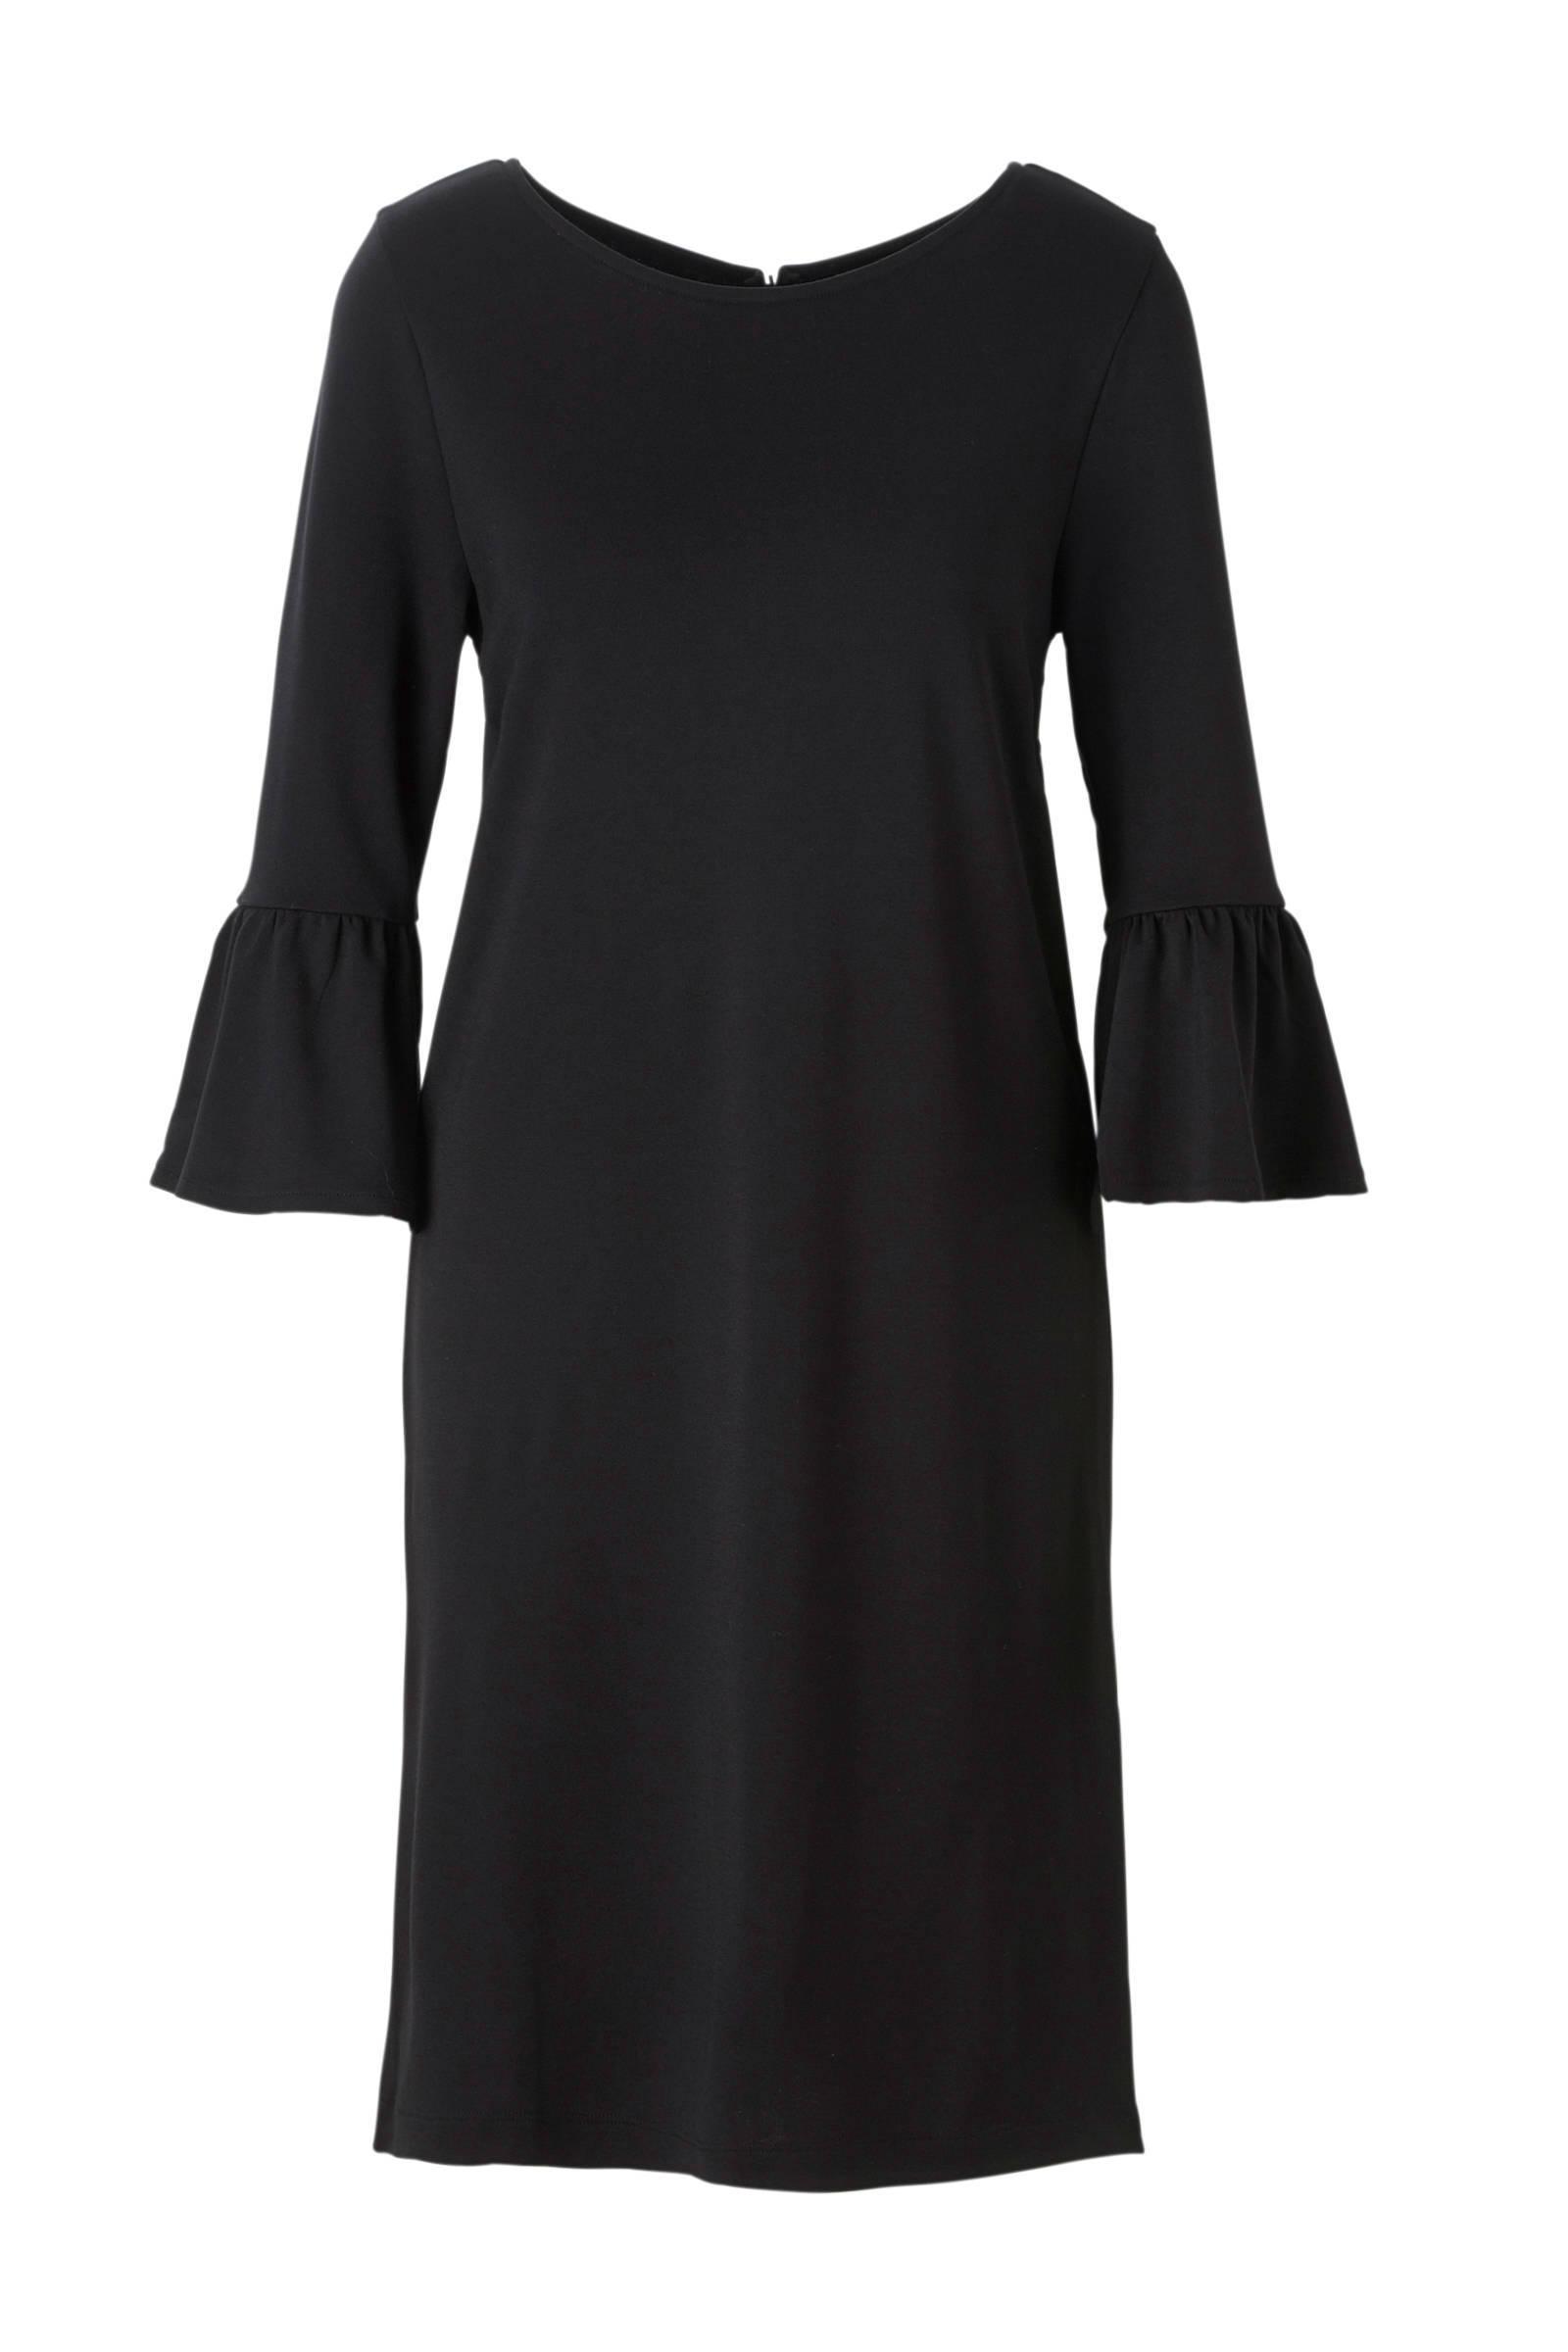 whkmp's own jurk